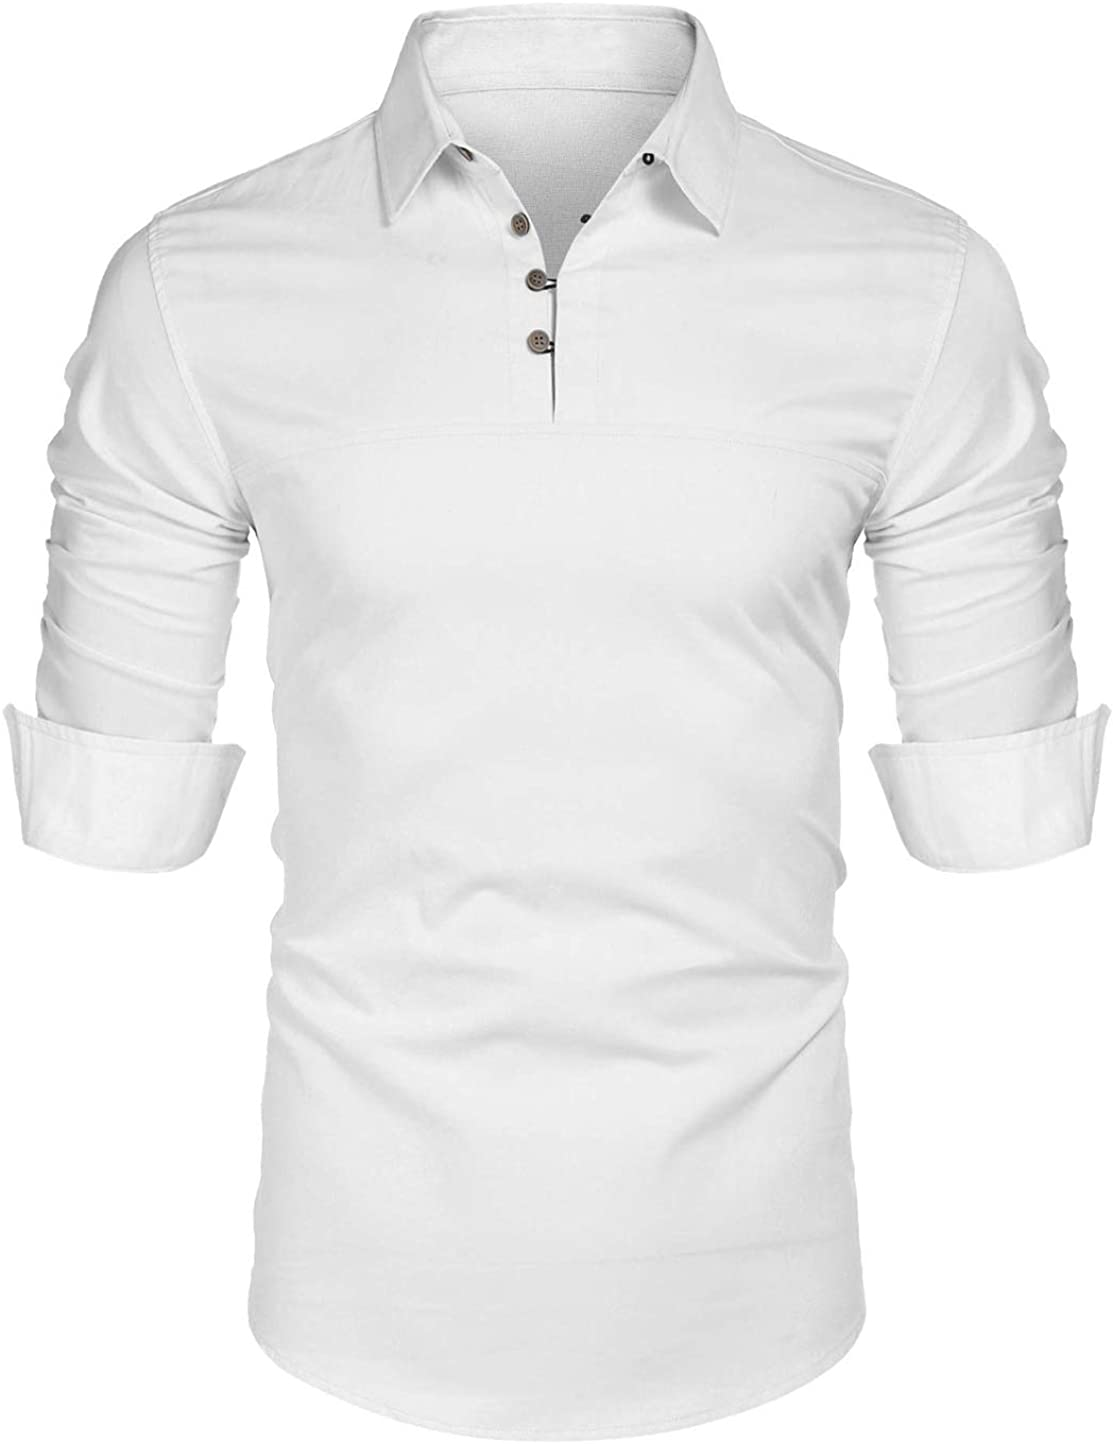 utcoco Men's Relaxed Fit Spread Collar Long Sleeve Cotton Linen Henley Shirt